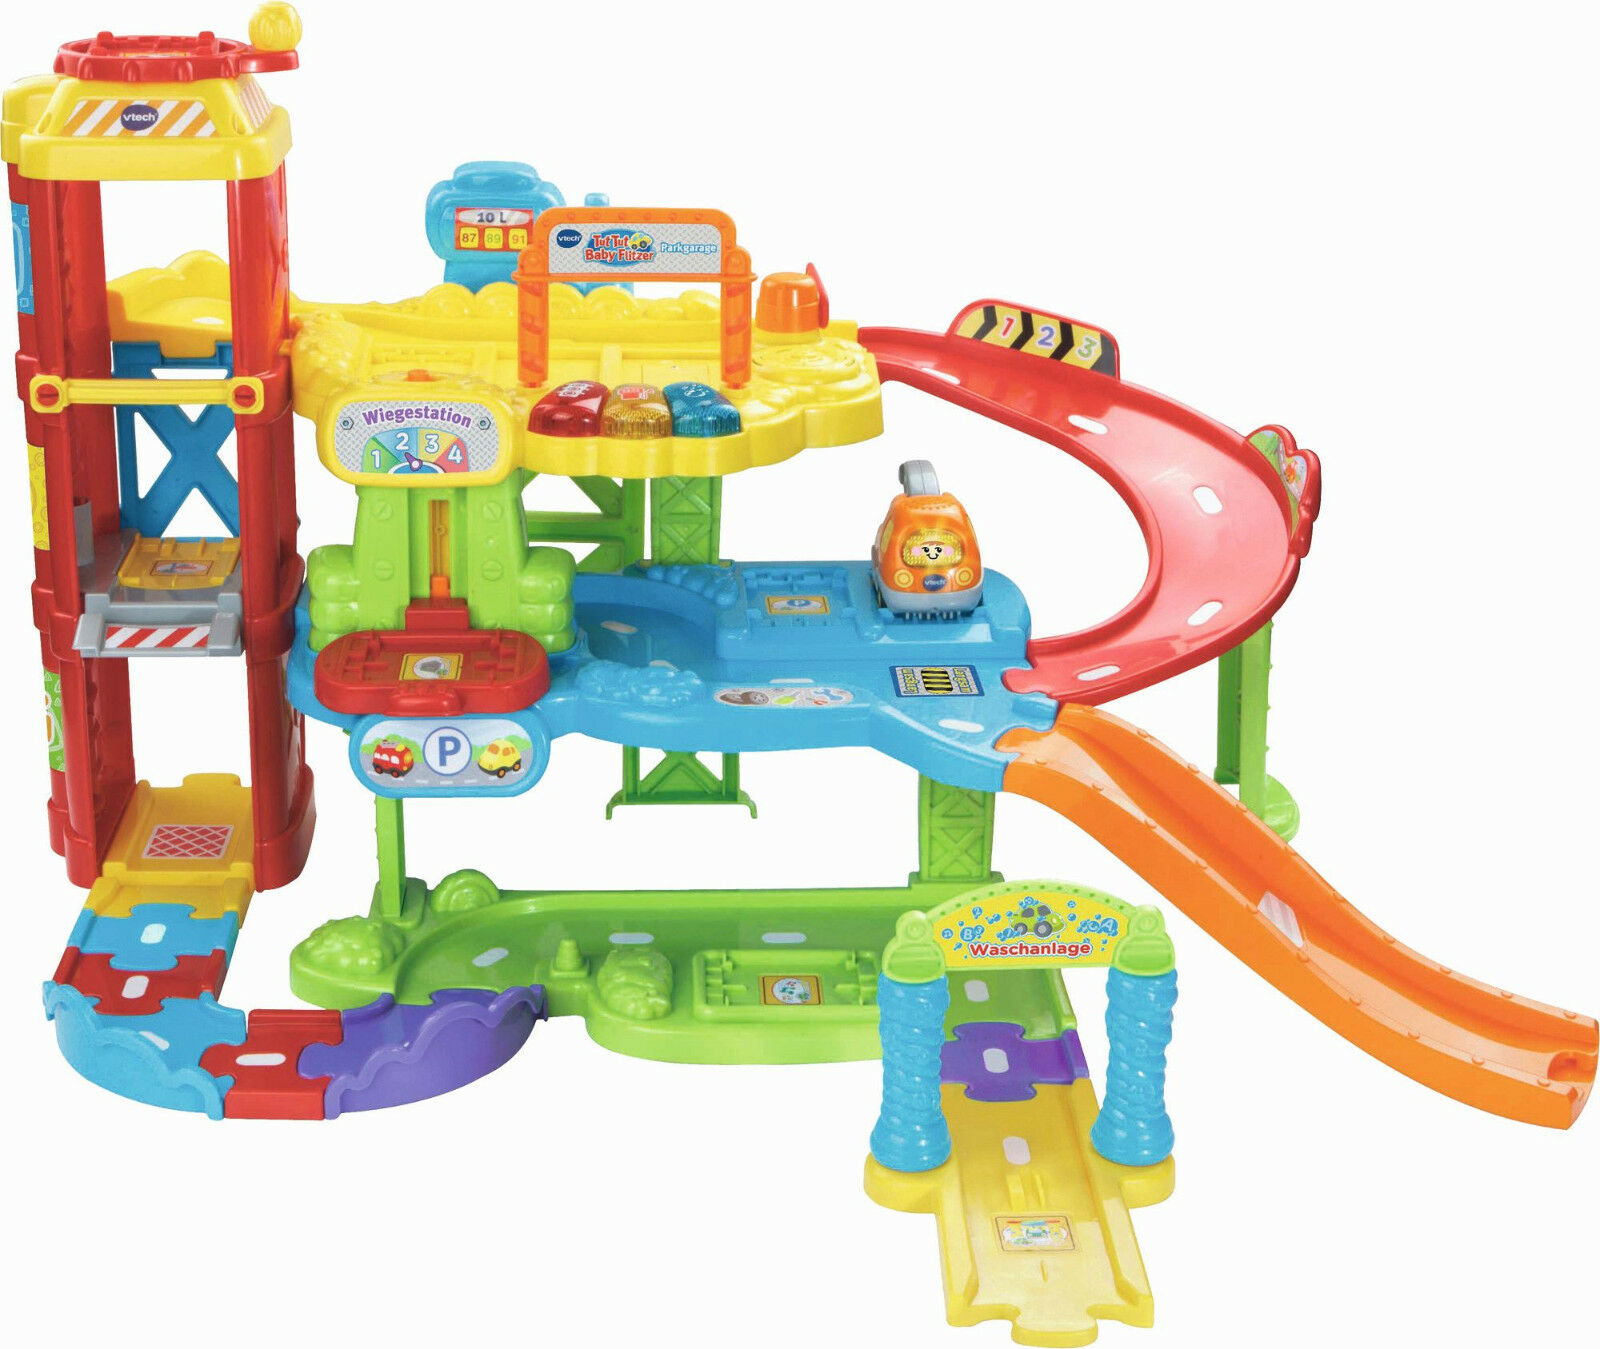 Vtech 180004 - Garage Parcheggio, Tut Tut Baby Flitzer, Nuovo / Conf. Orig.